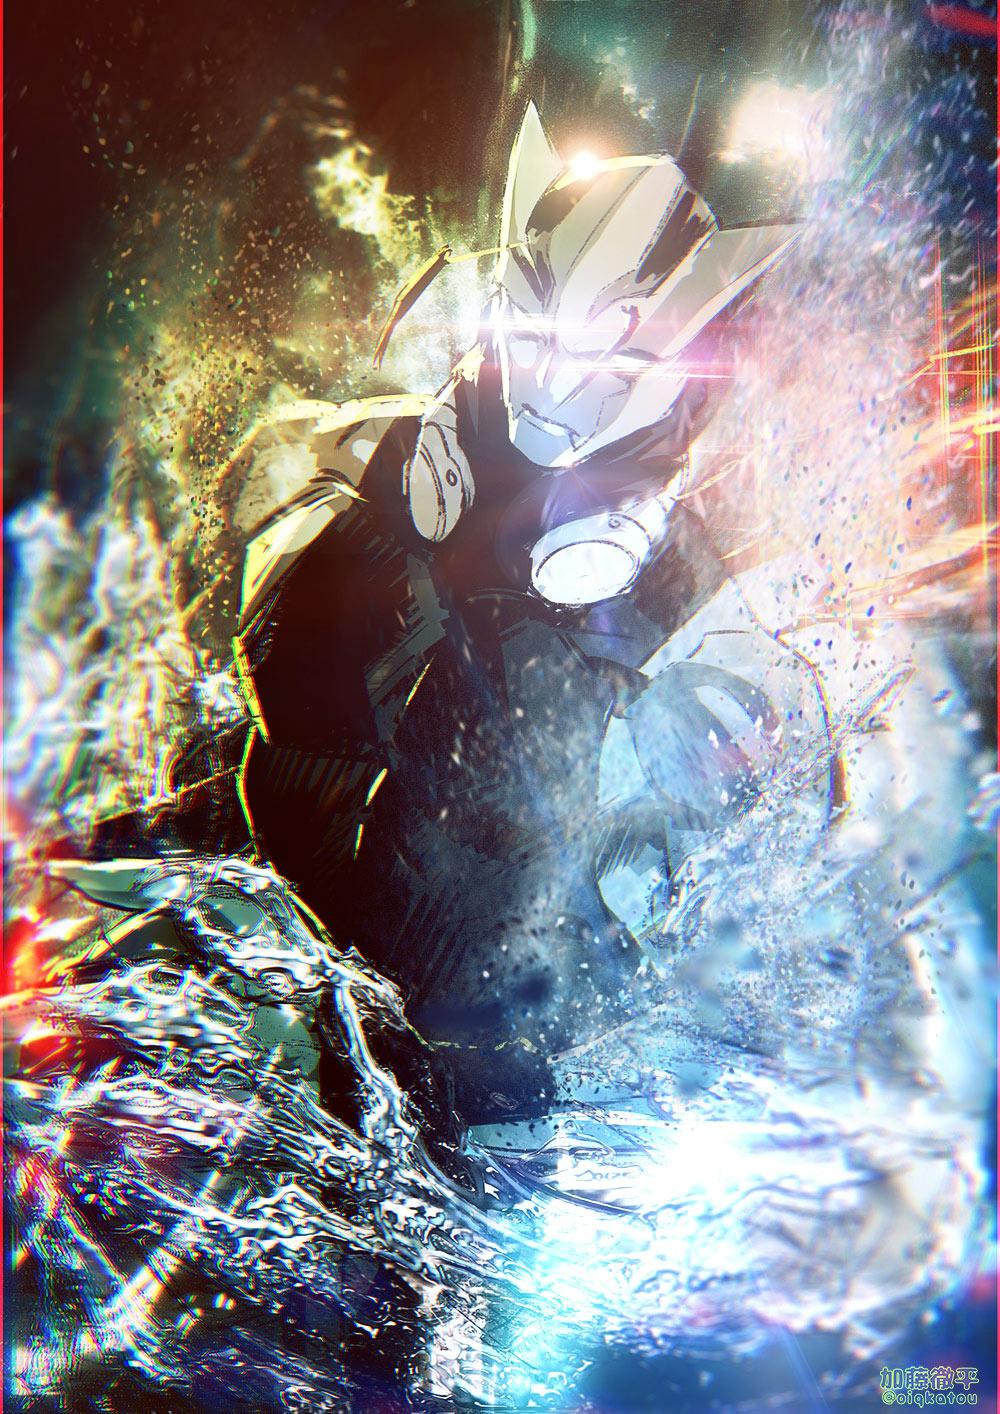 1boy blue_skin fish_boy glowing glowing_eyes goggles goggles_around_neck highres katou_teppei kekkai_sensen male_focus monster_boy no_pupils shirt solo tank_top tight_shirt water zed_o'_brien